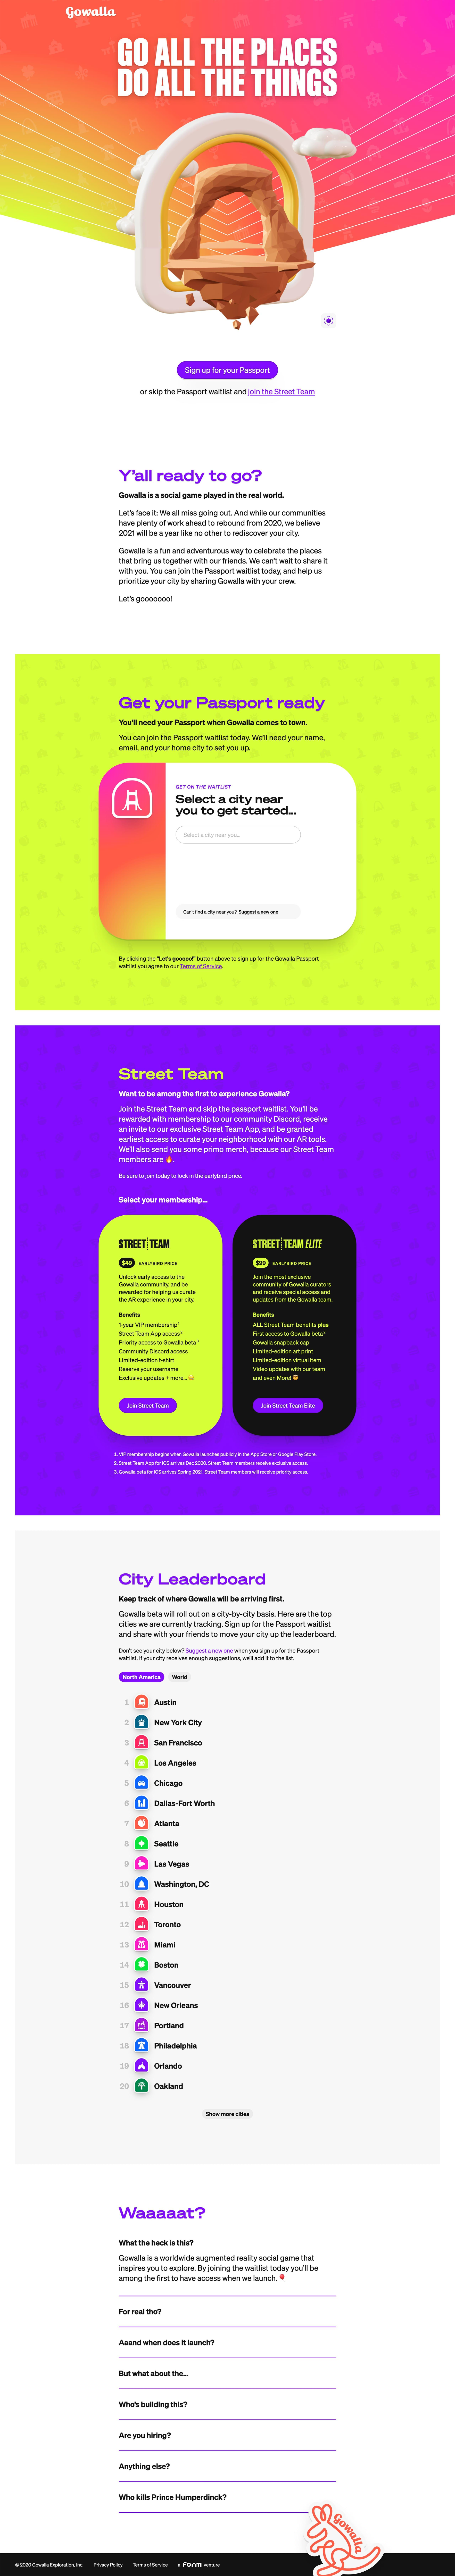 Gowalla Website Screenshot